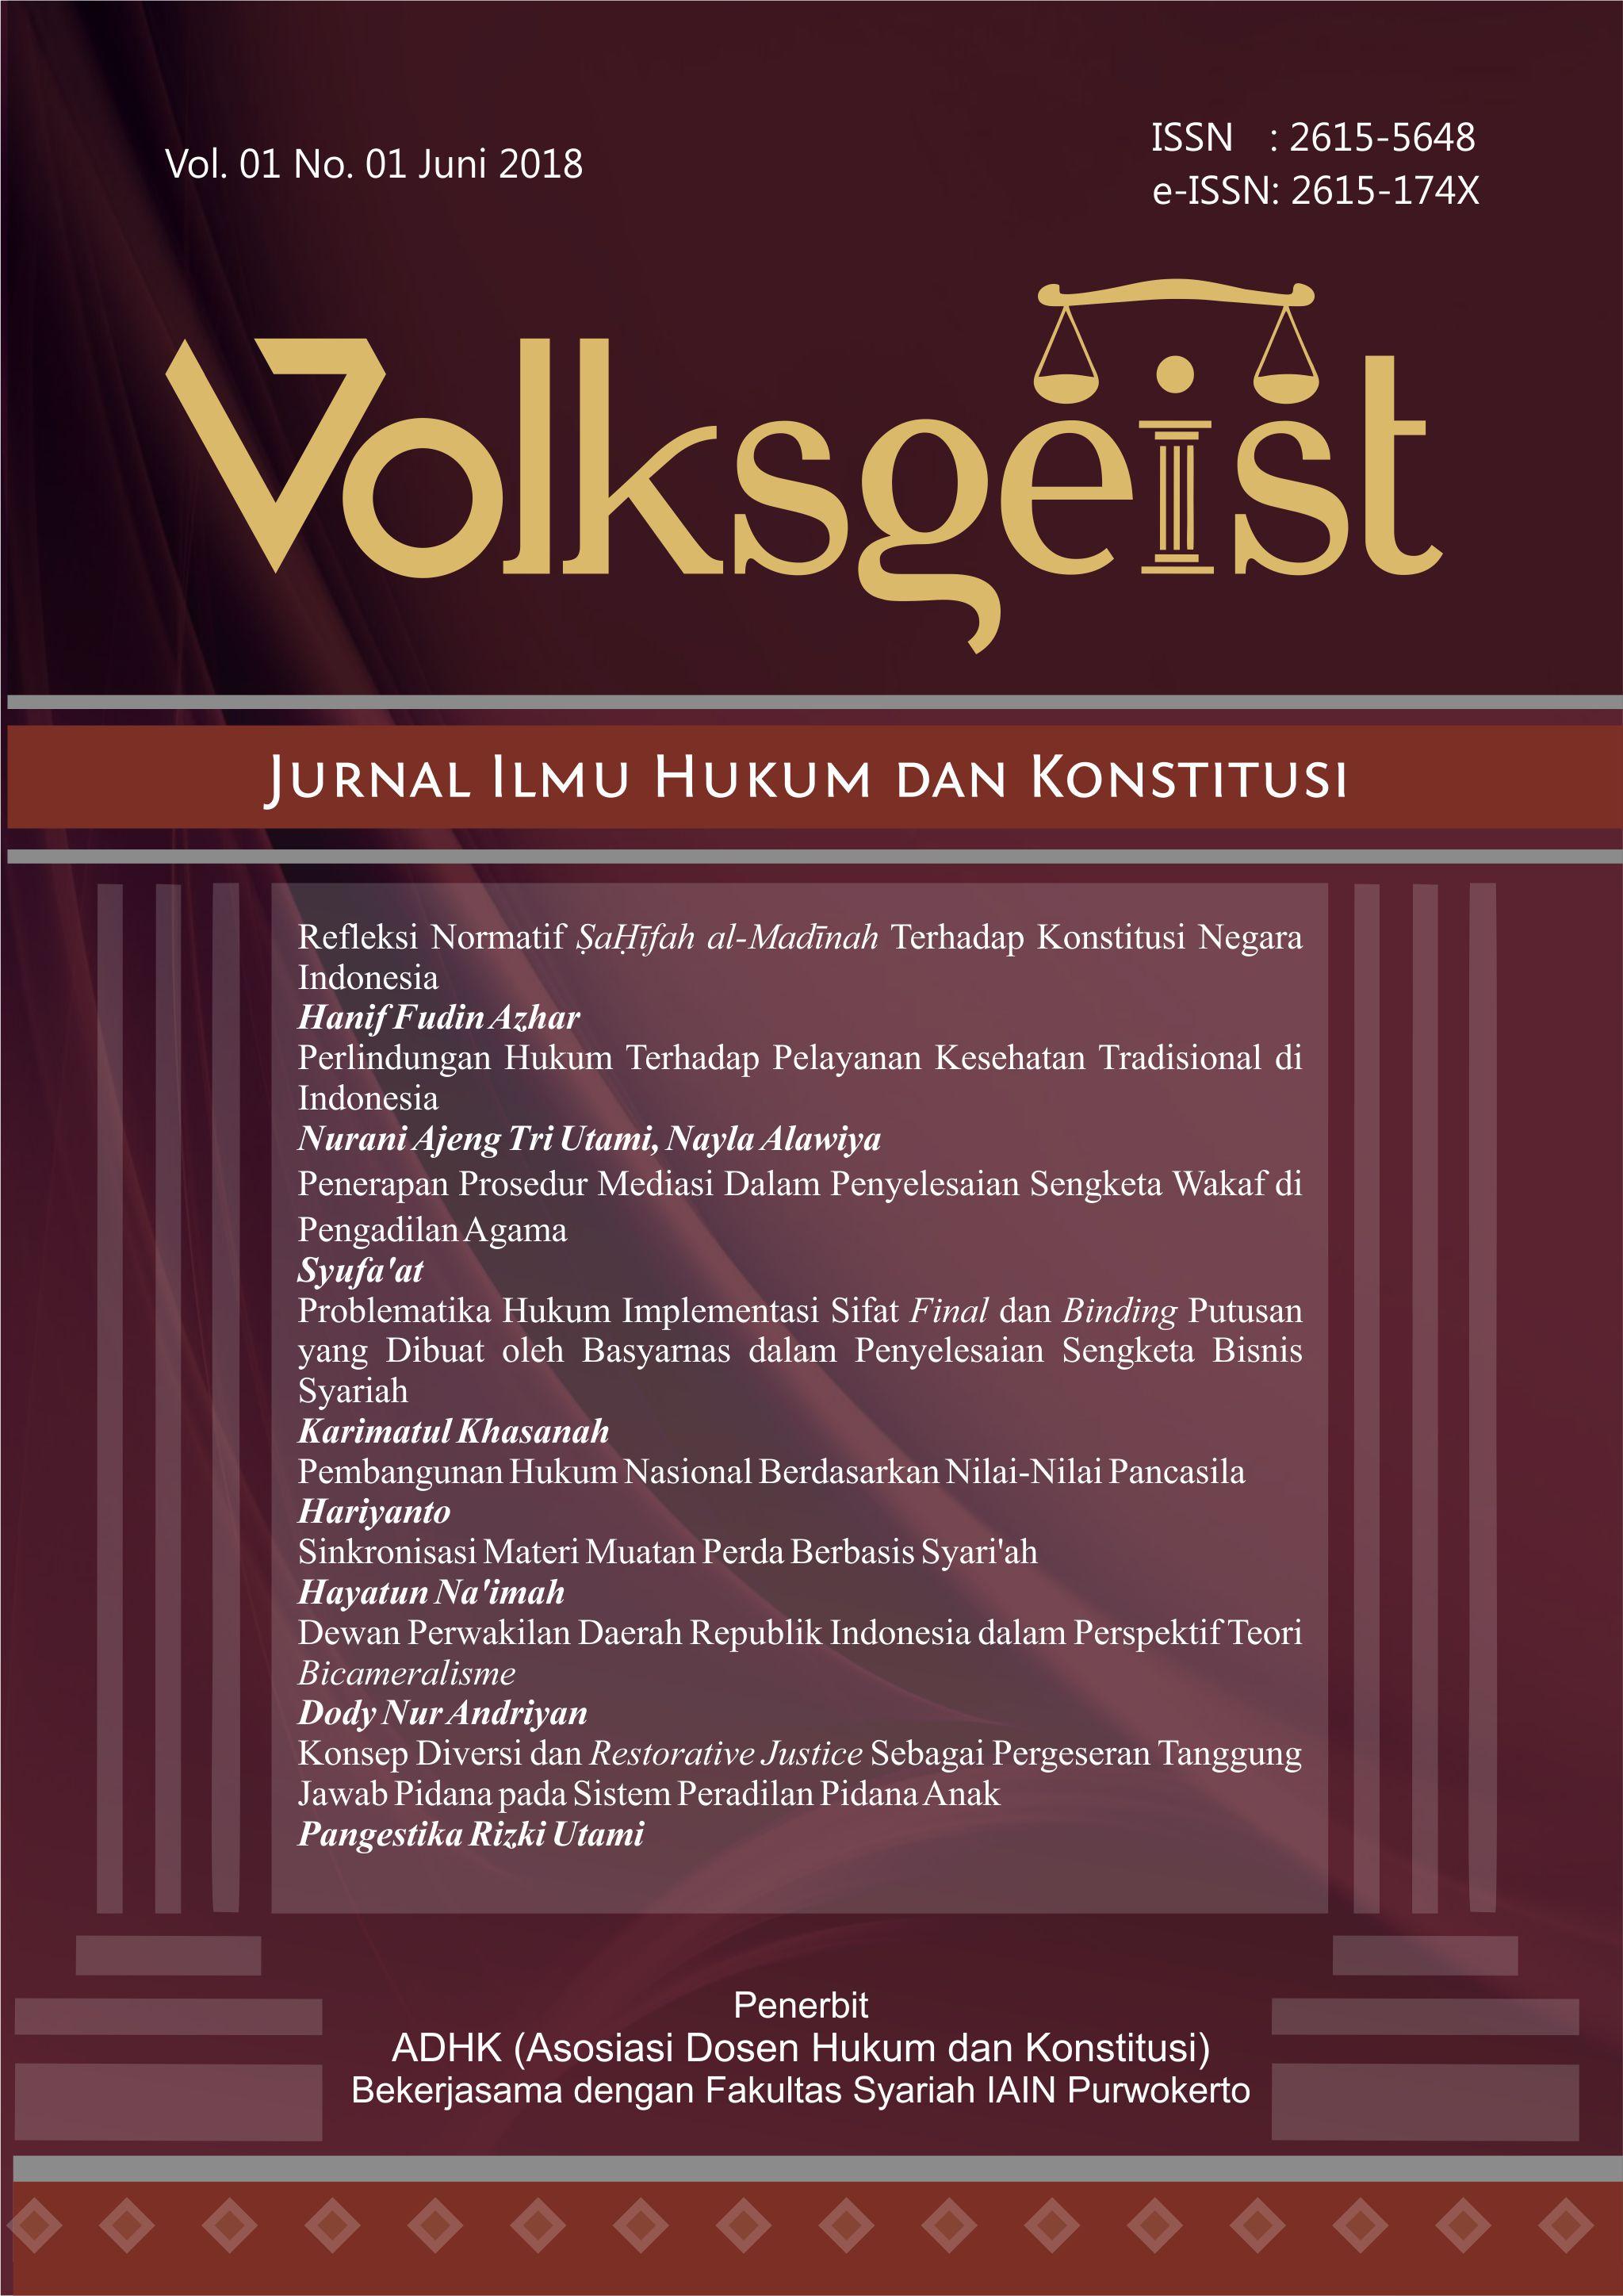 cover Volksgeist Jurnal Ilmu Hukum dan Konstitusi